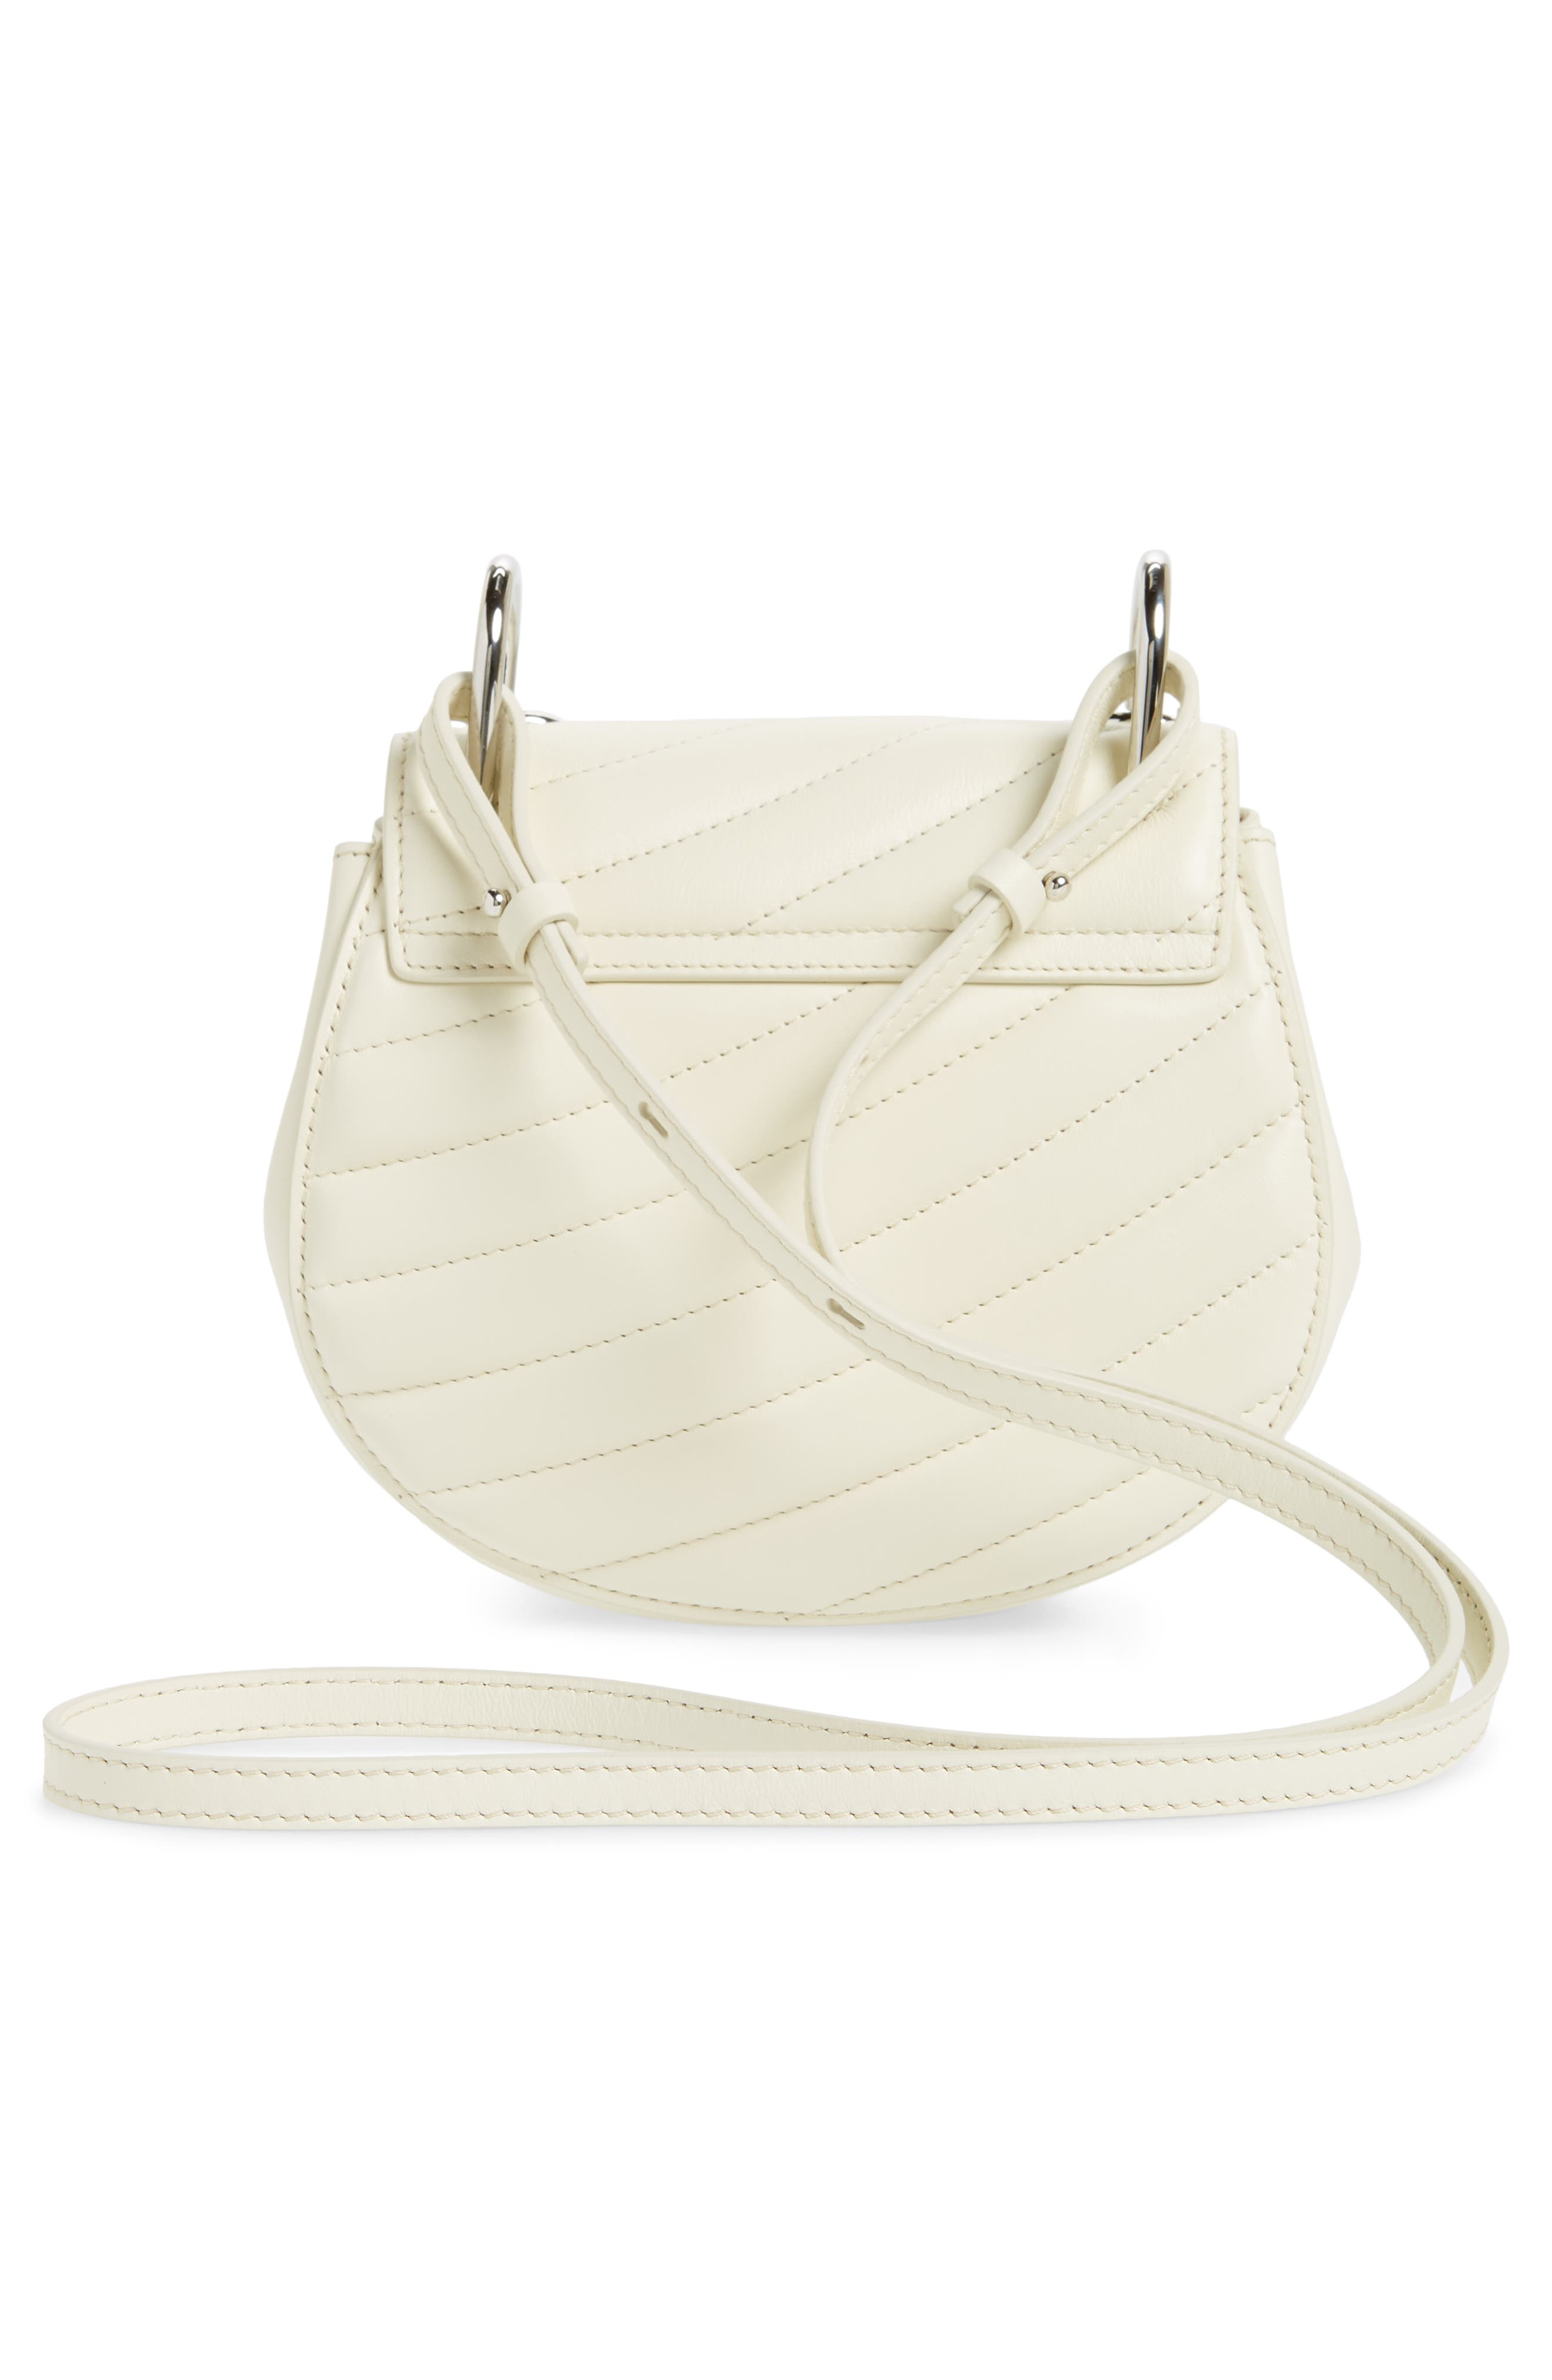 Mini Drew Bijoux Leather Shoulder Bag,                             Alternate thumbnail 6, color,                             Natural White